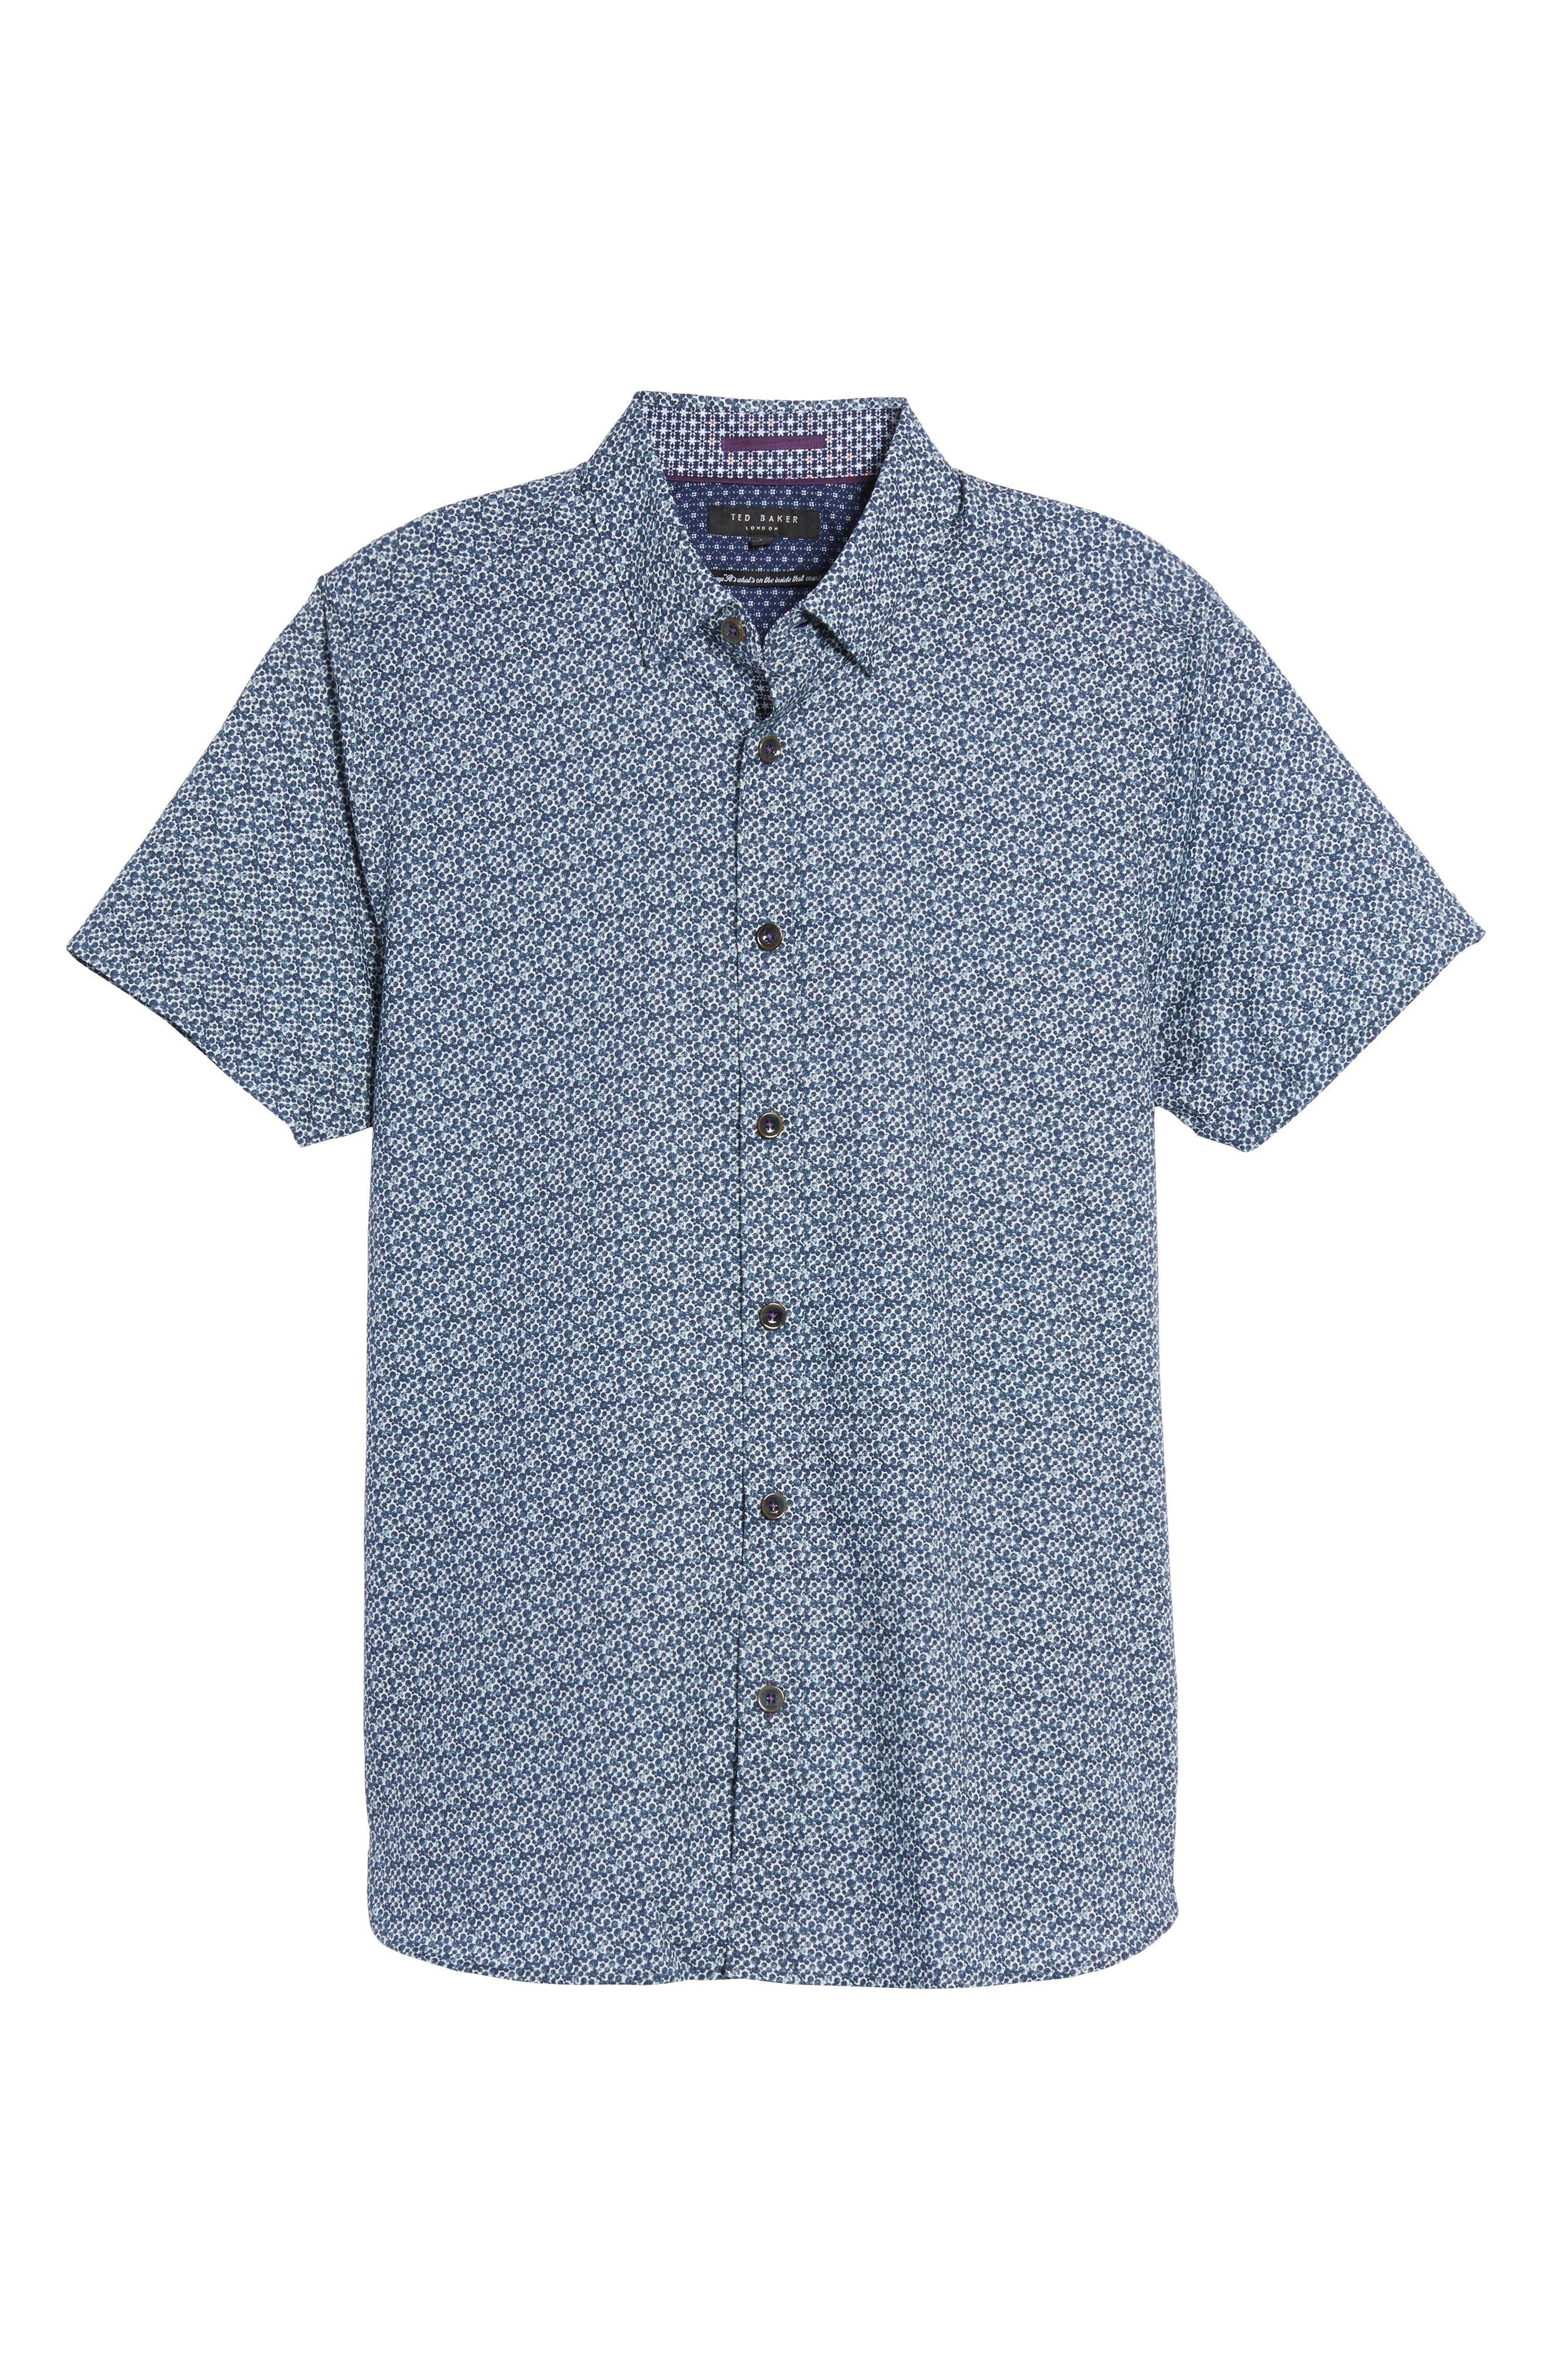 Bubbly Extra Slim Fit Print Sport Shirt,                             Alternate thumbnail 6, color,                             410